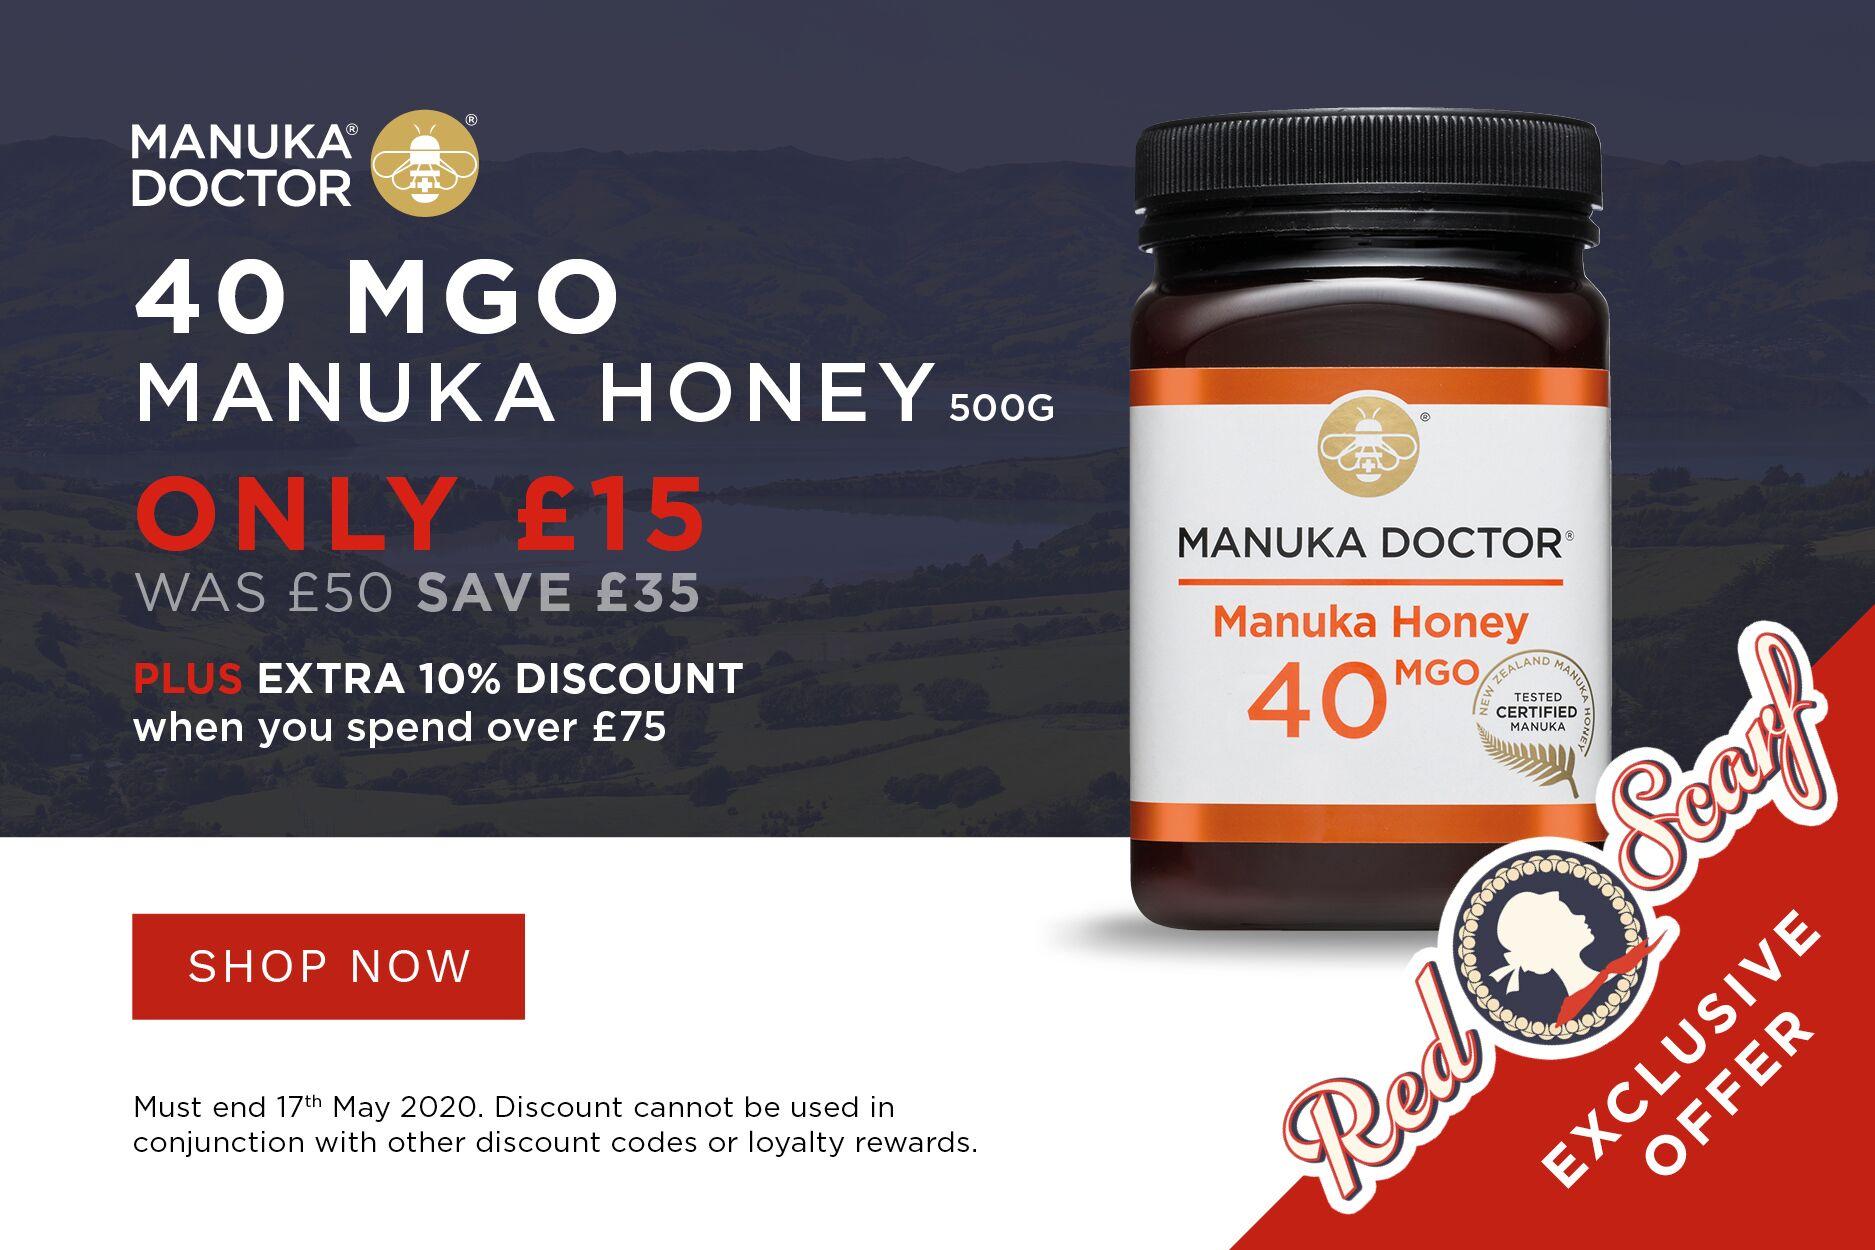 Manuka Doctor   排毒养胃蜂蜜低至3折,还有限时额外9折满额减!